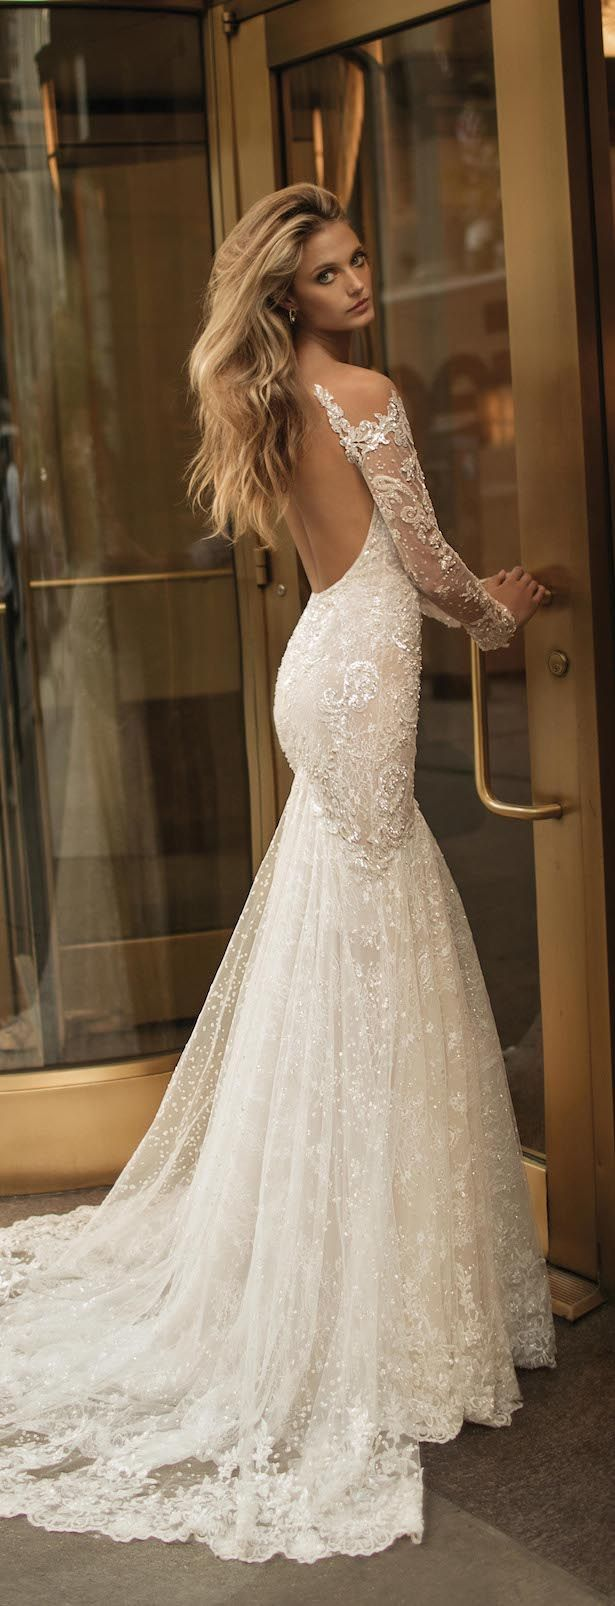 Redneck wedding dress  Berta Bridal Fall  Collection in   Wedding  Pinterest